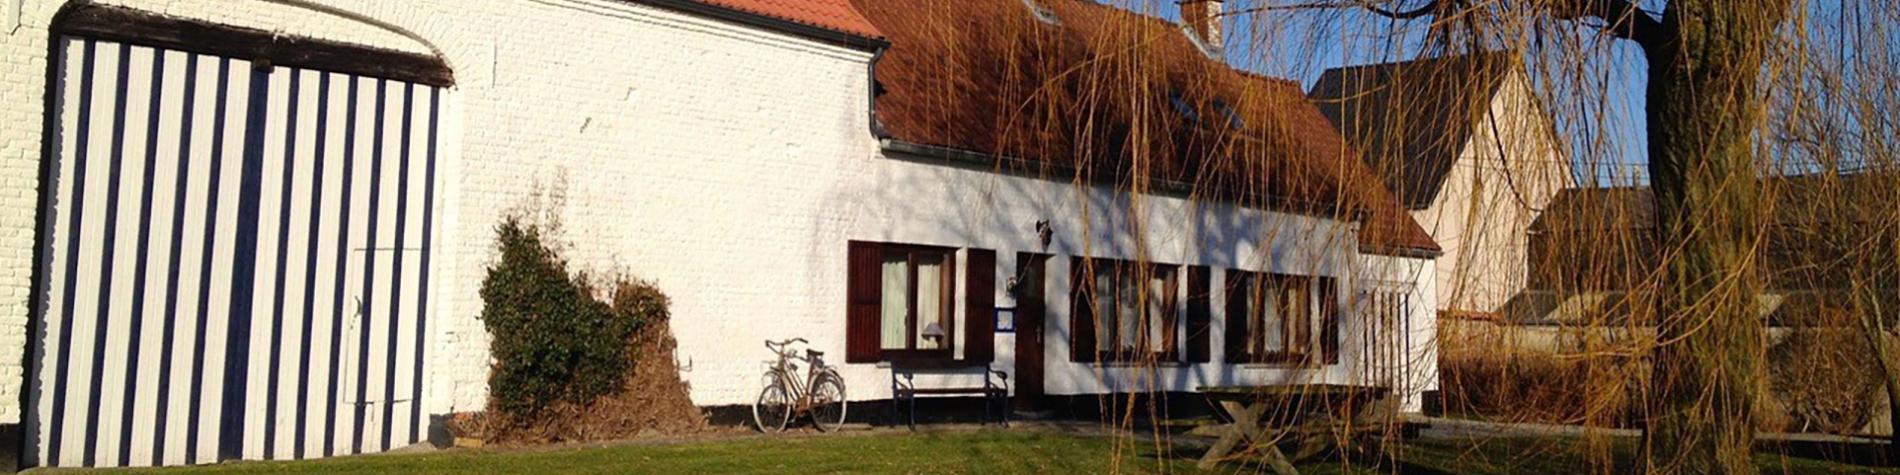 Gîte rural - Le Ruiclot - Huissignies